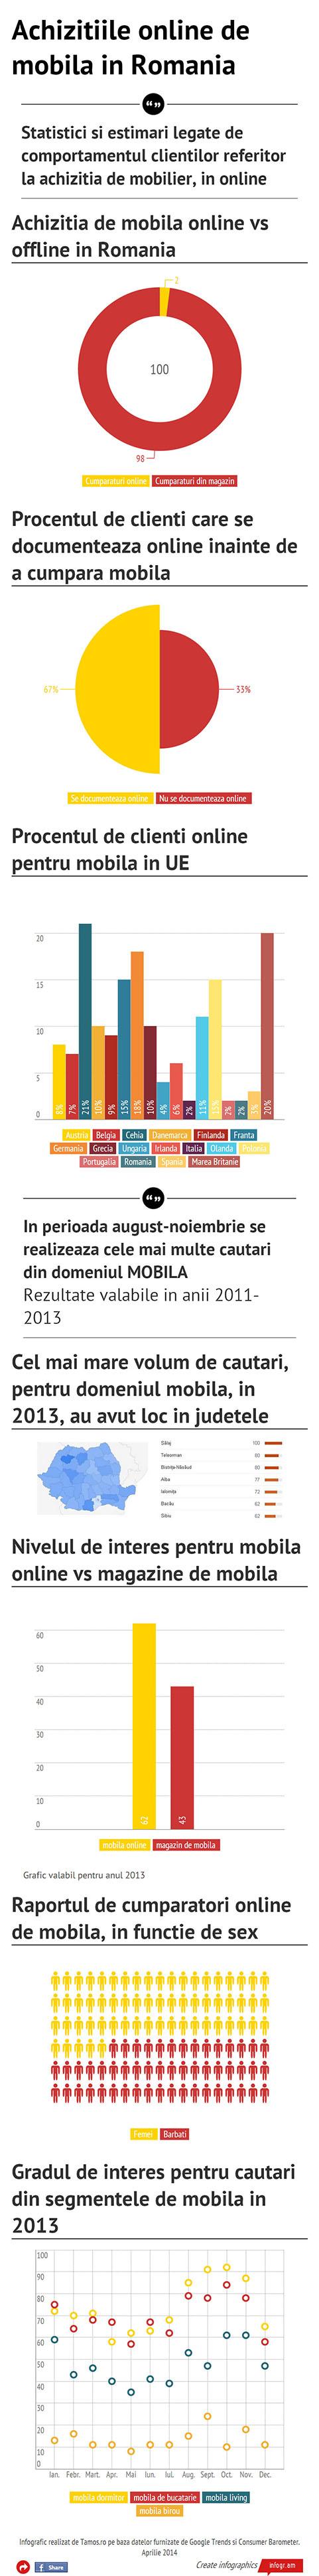 infografic_tamos